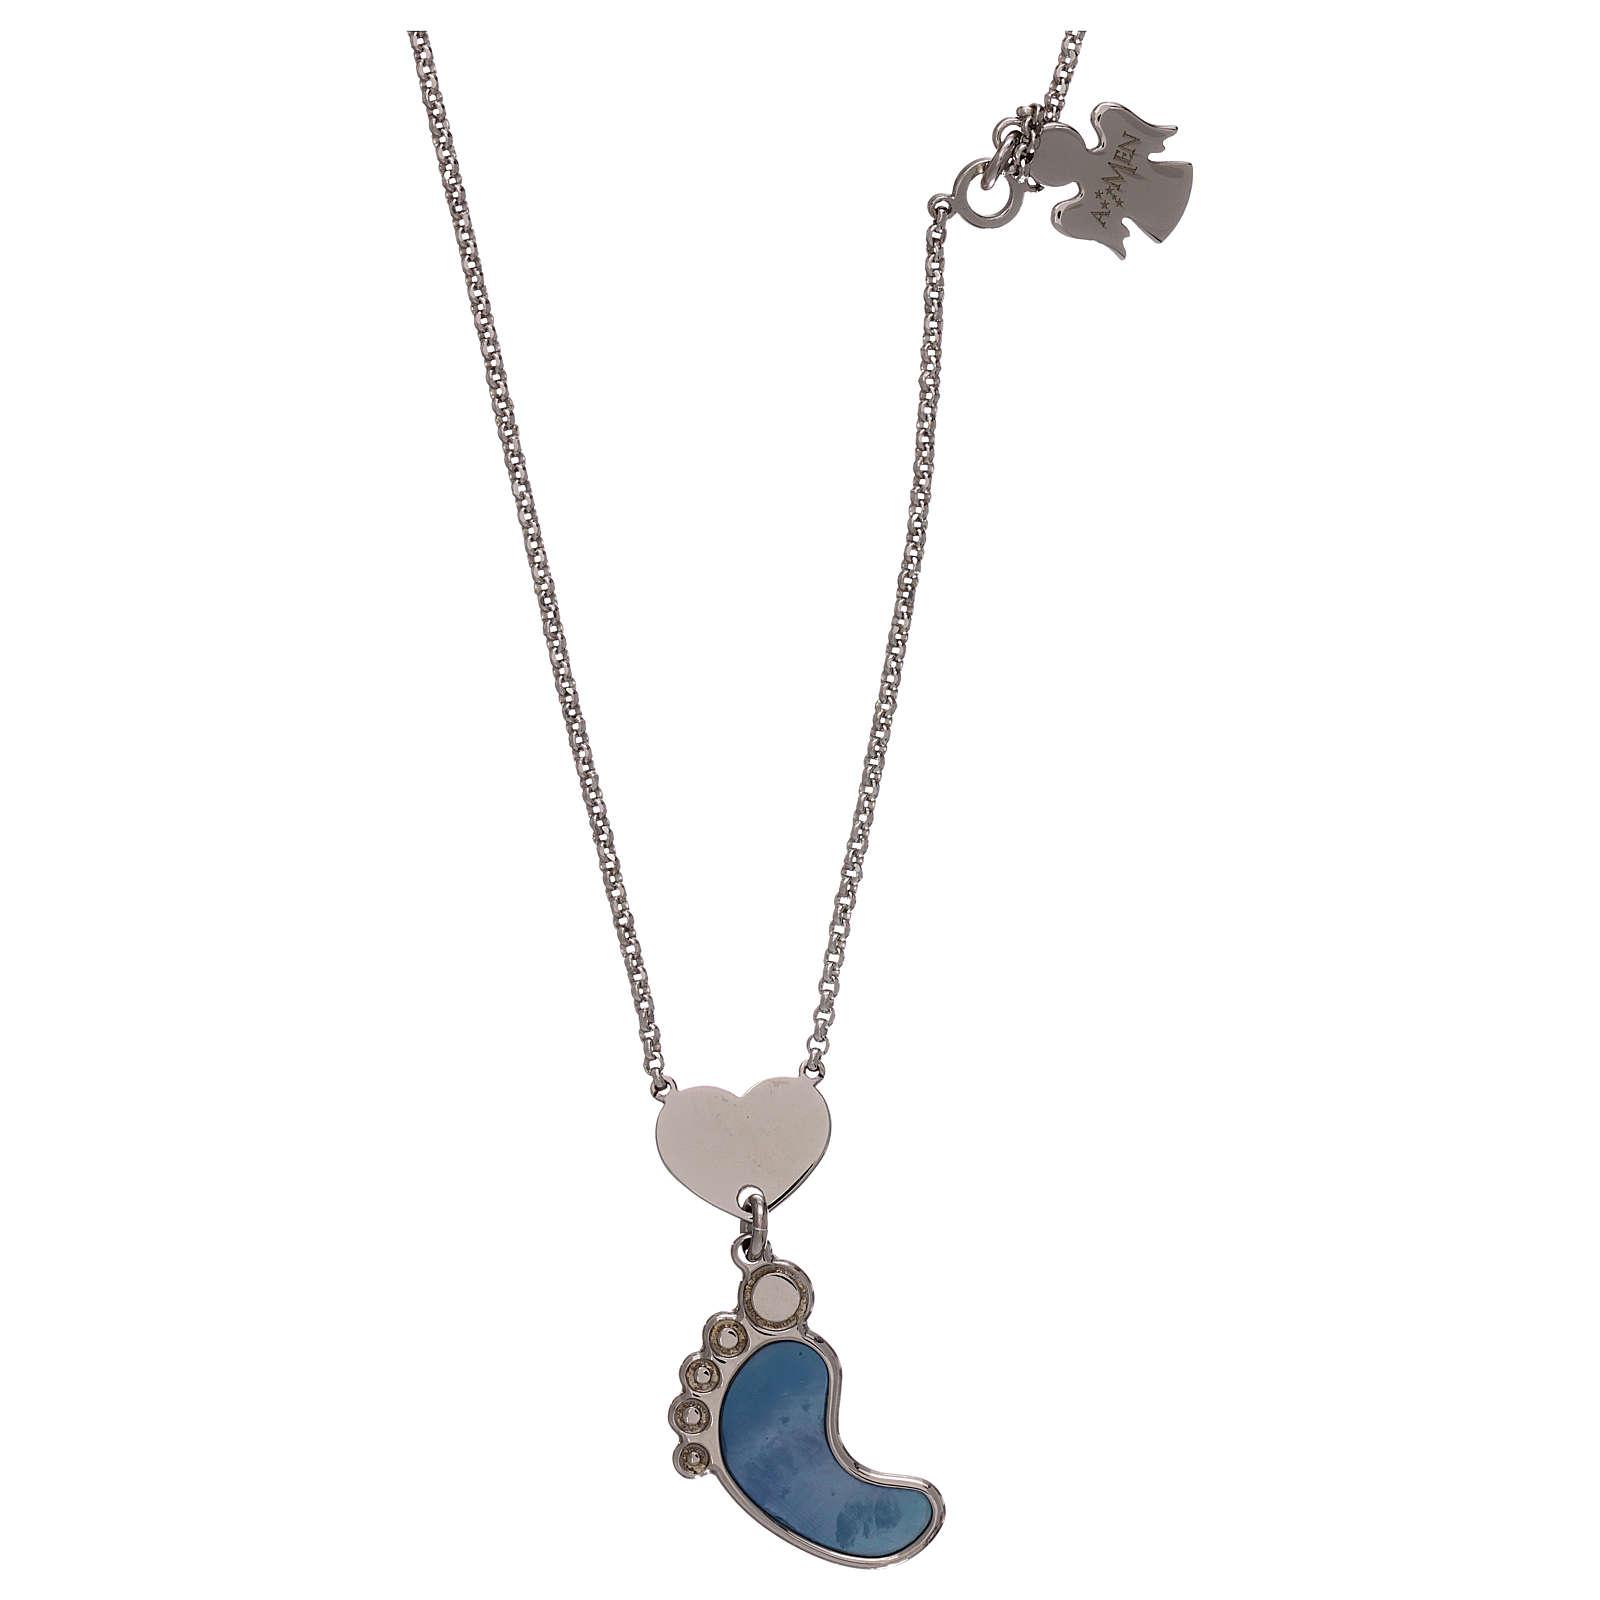 Collana argento 925 ciondolo piede madreperla blu AMEN 4